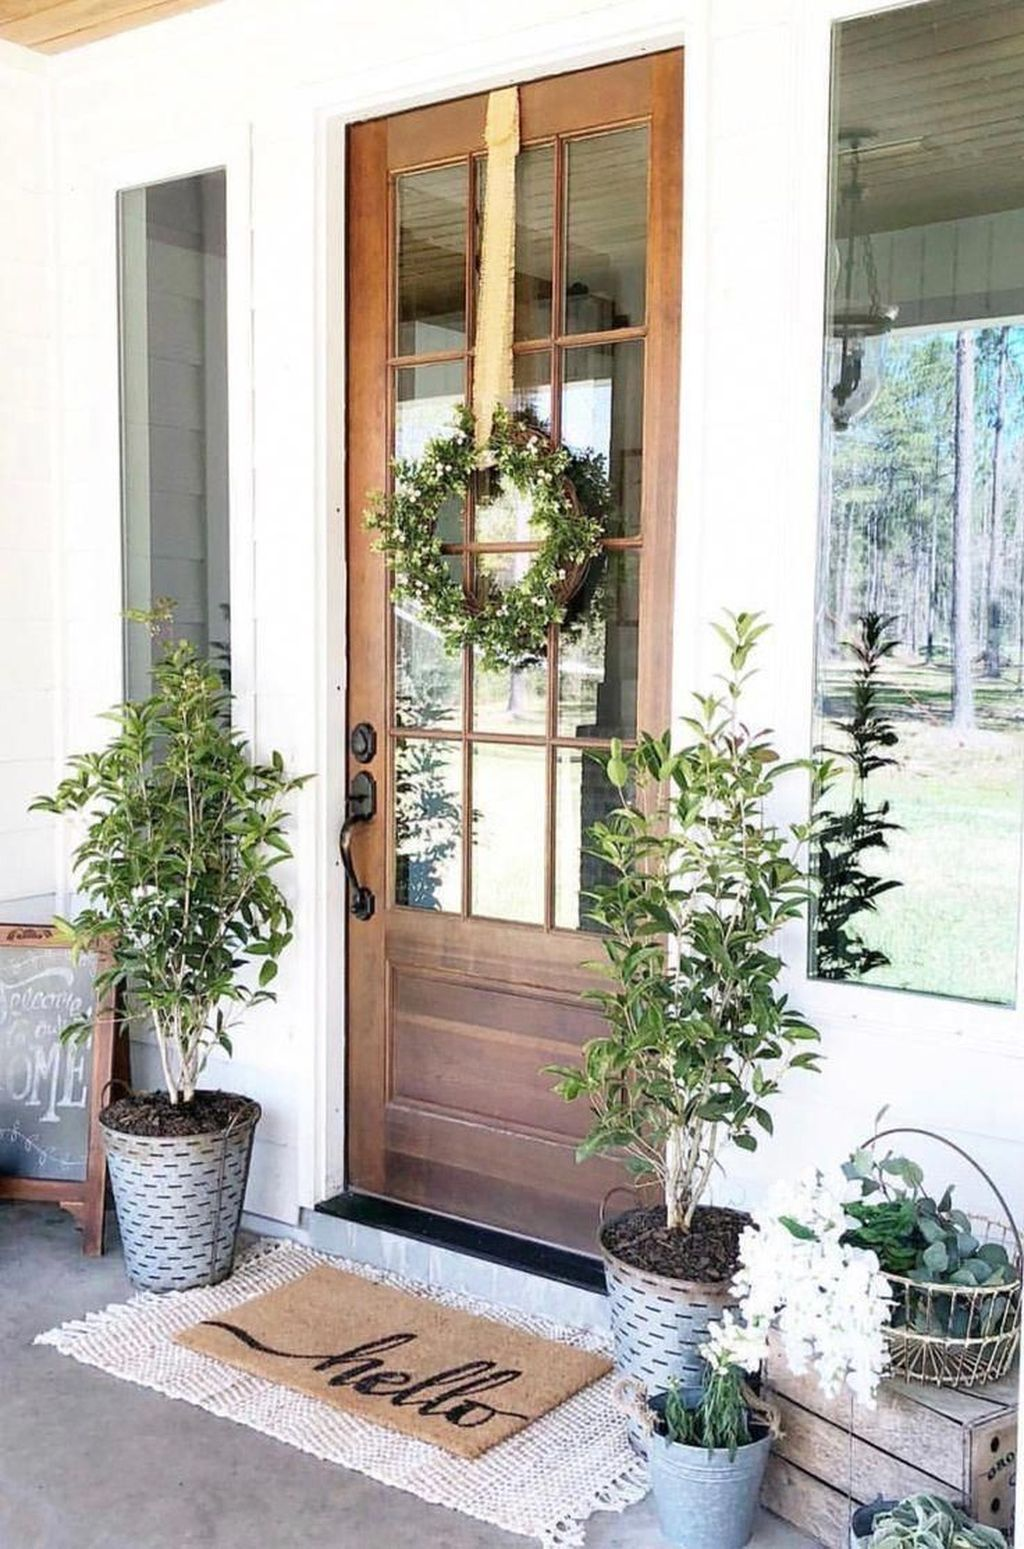 Inspiring Spring Planters Design Ideas For Front Door 02